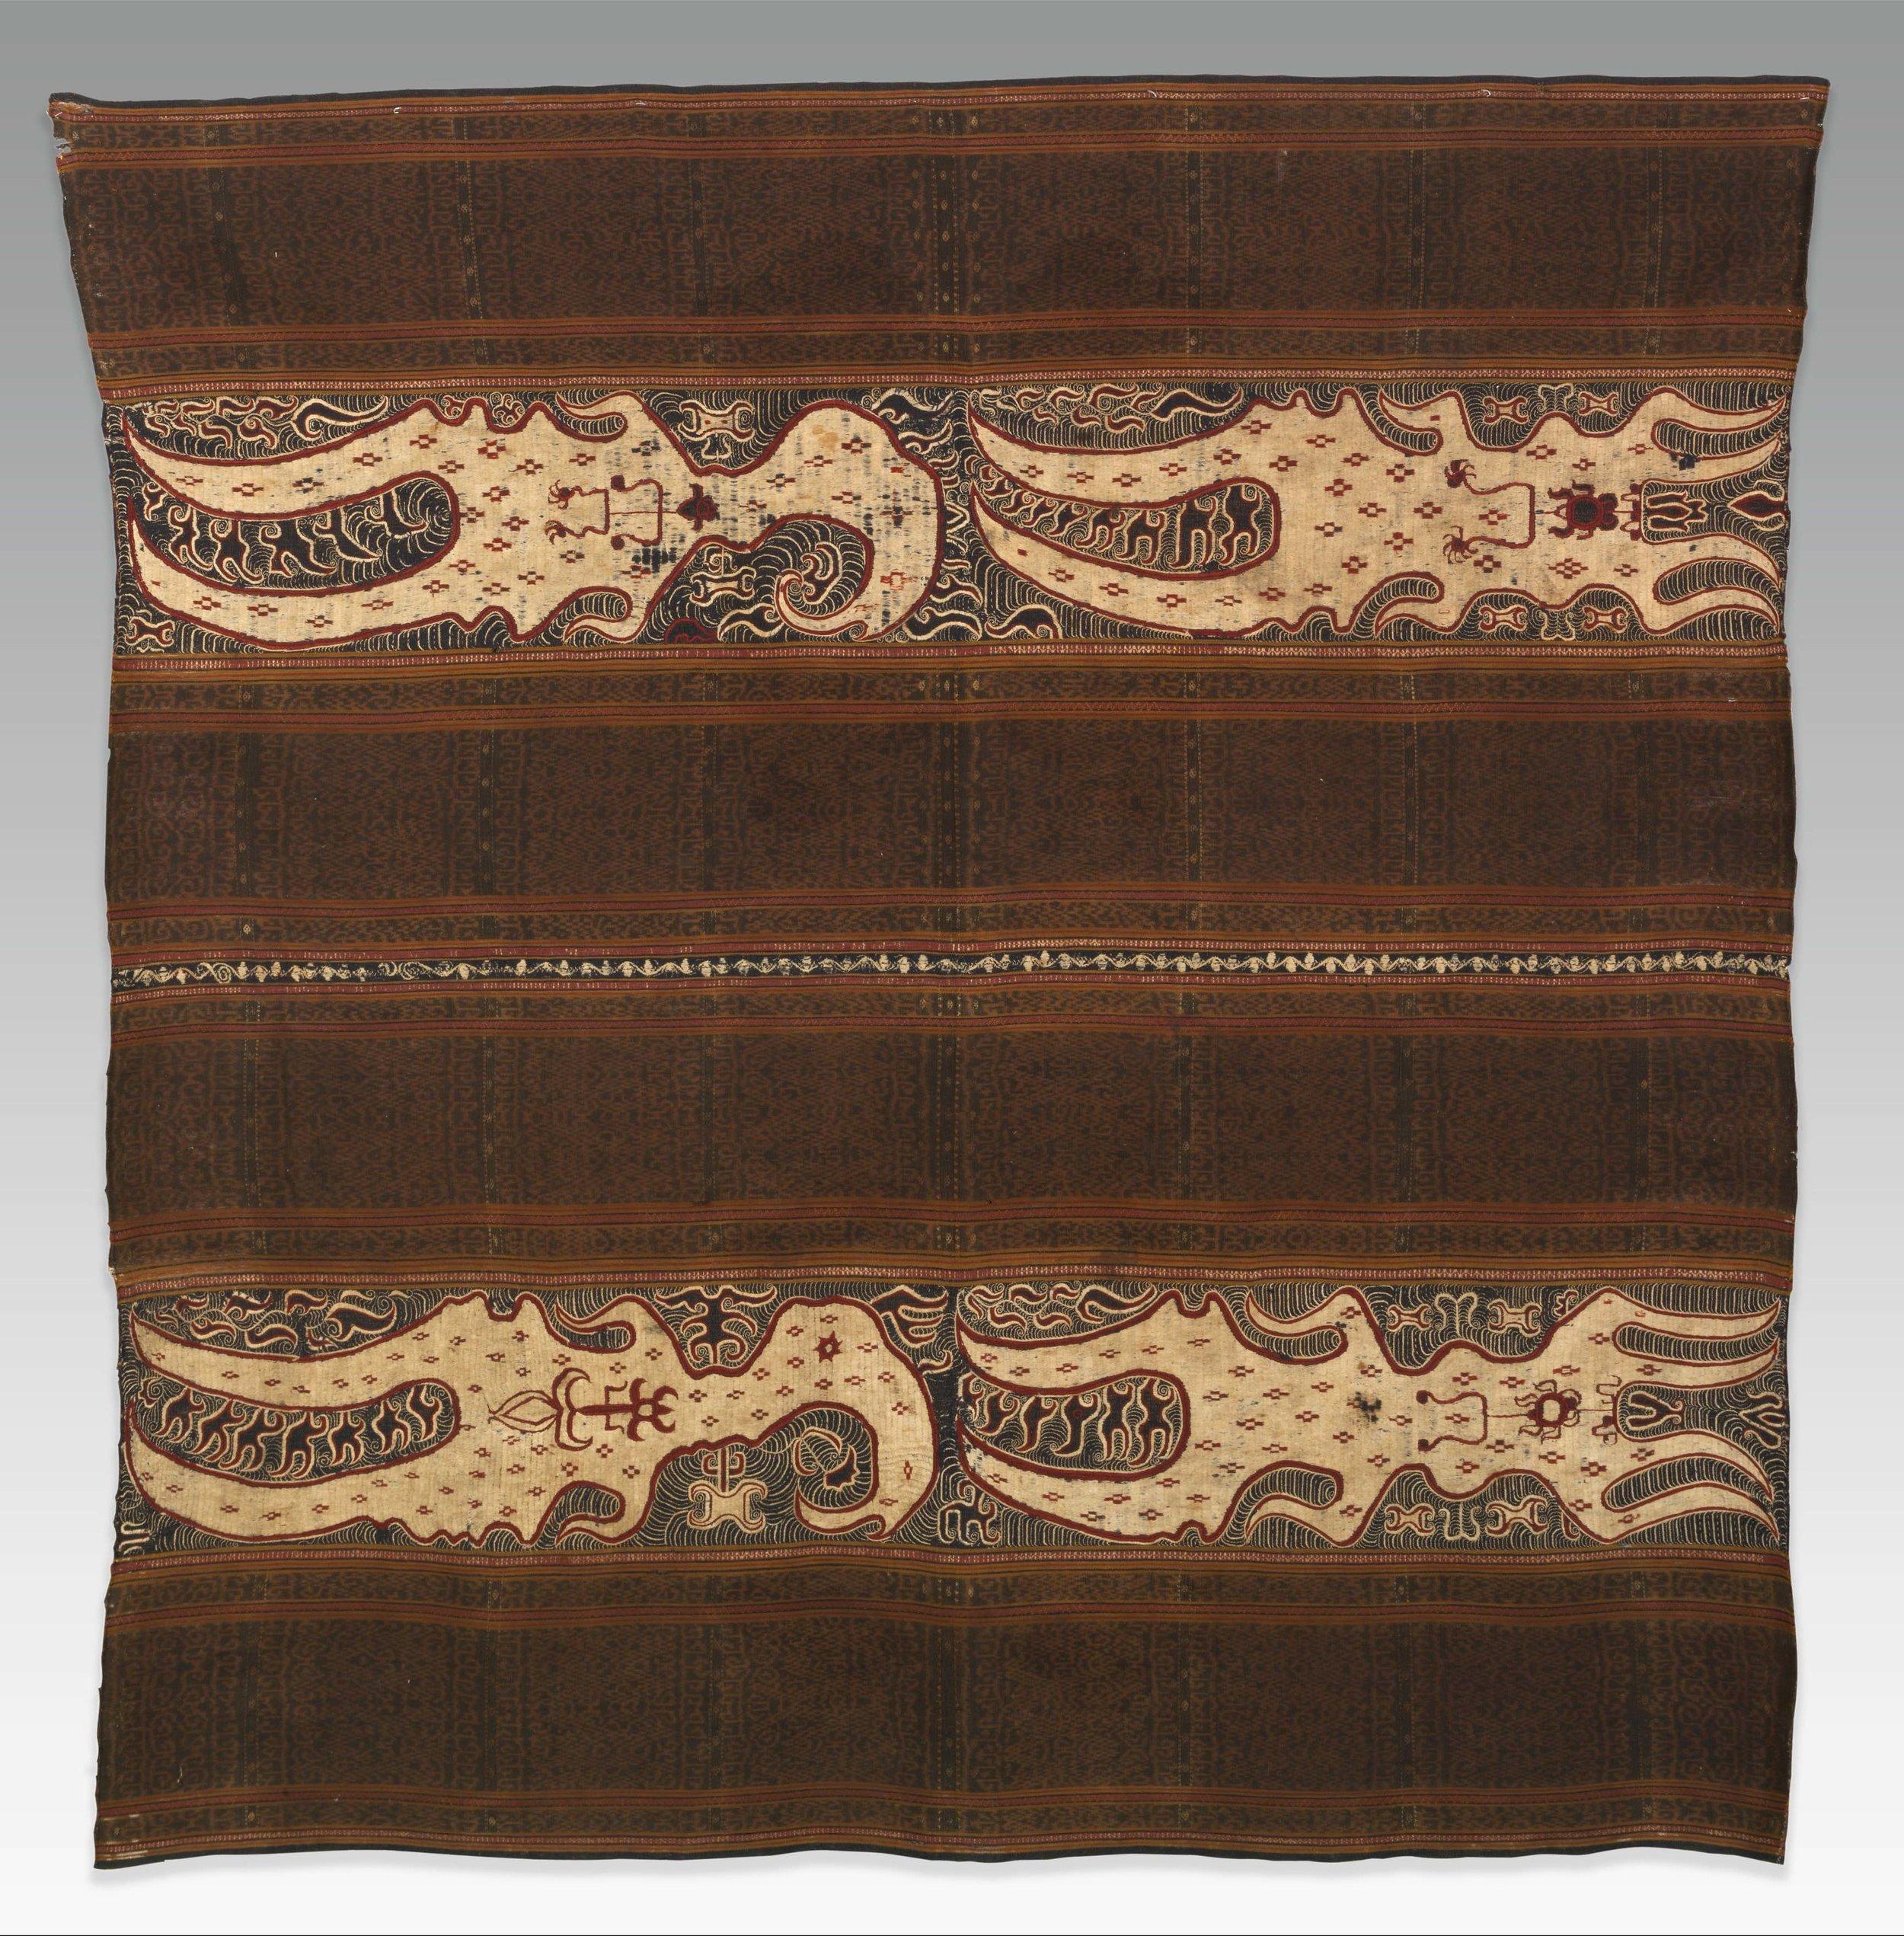 Woman's Ceremonial Skirt |  Tapis Inu  © The Metropolitan Museum of Art | New York, USA